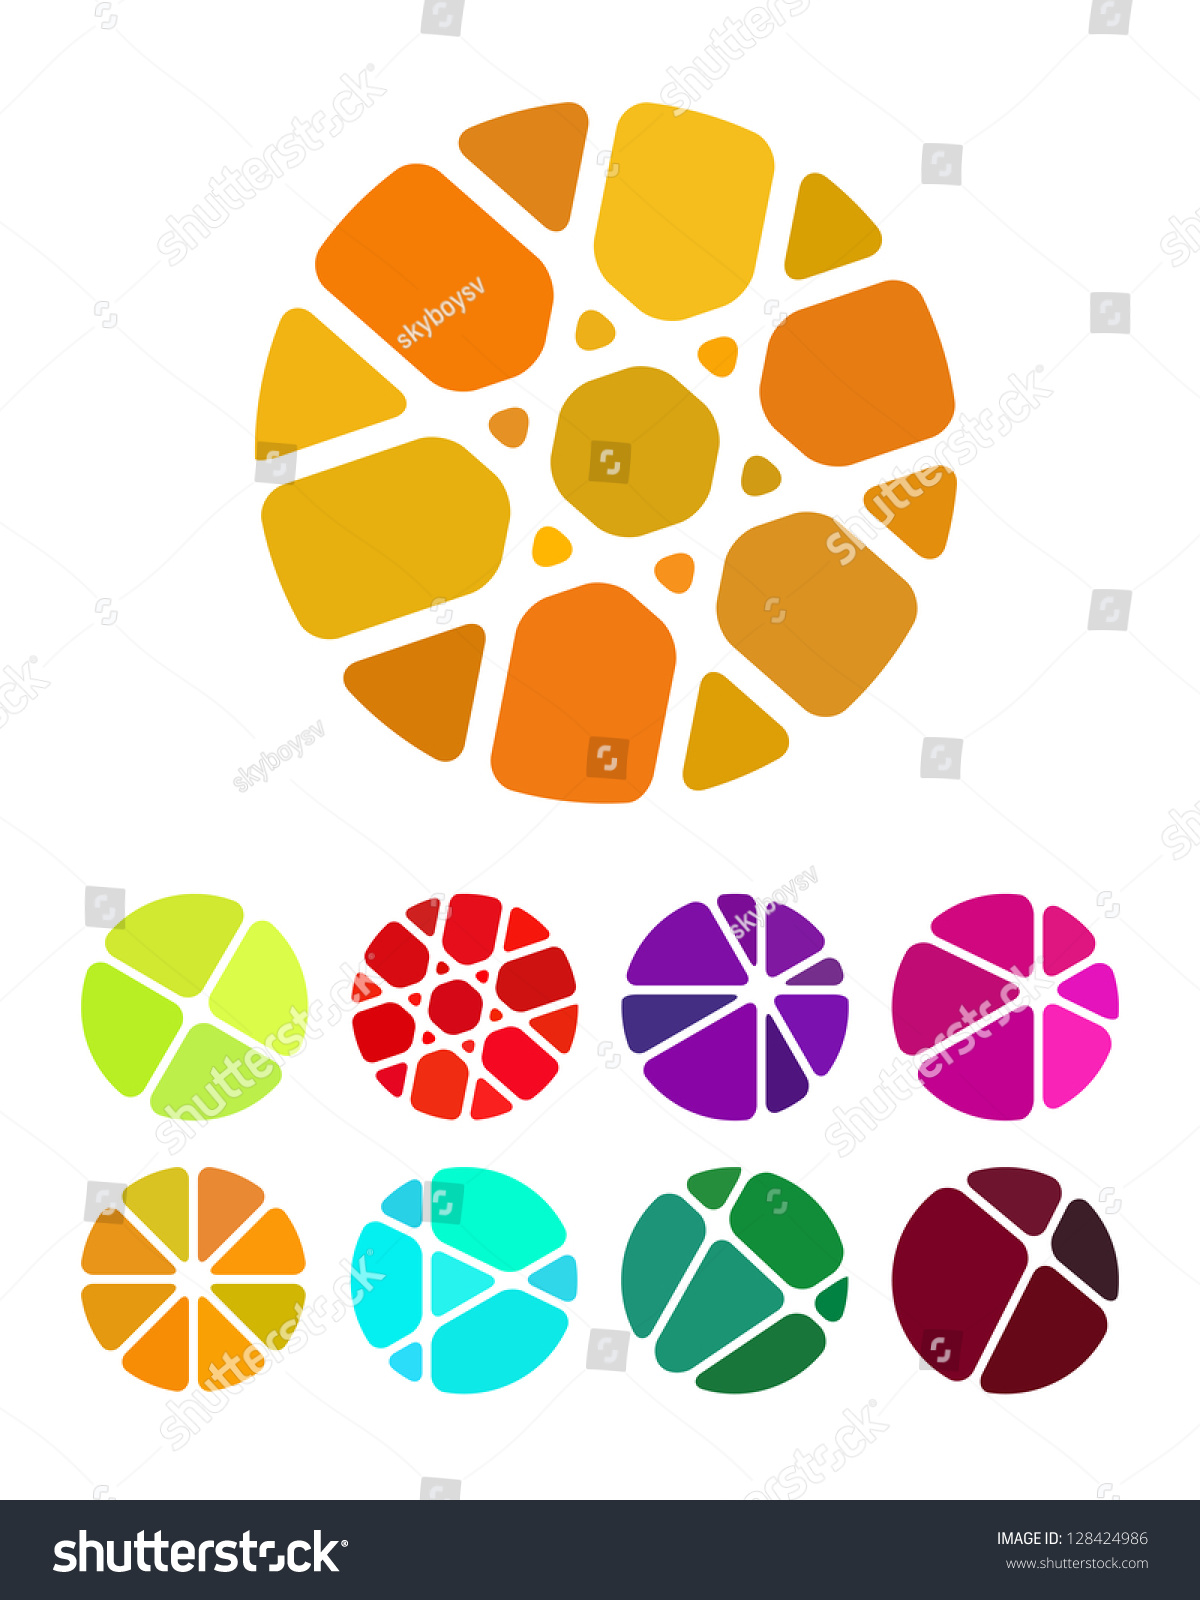 Edit Vectors Free Online Design Round Shutterstock Editor